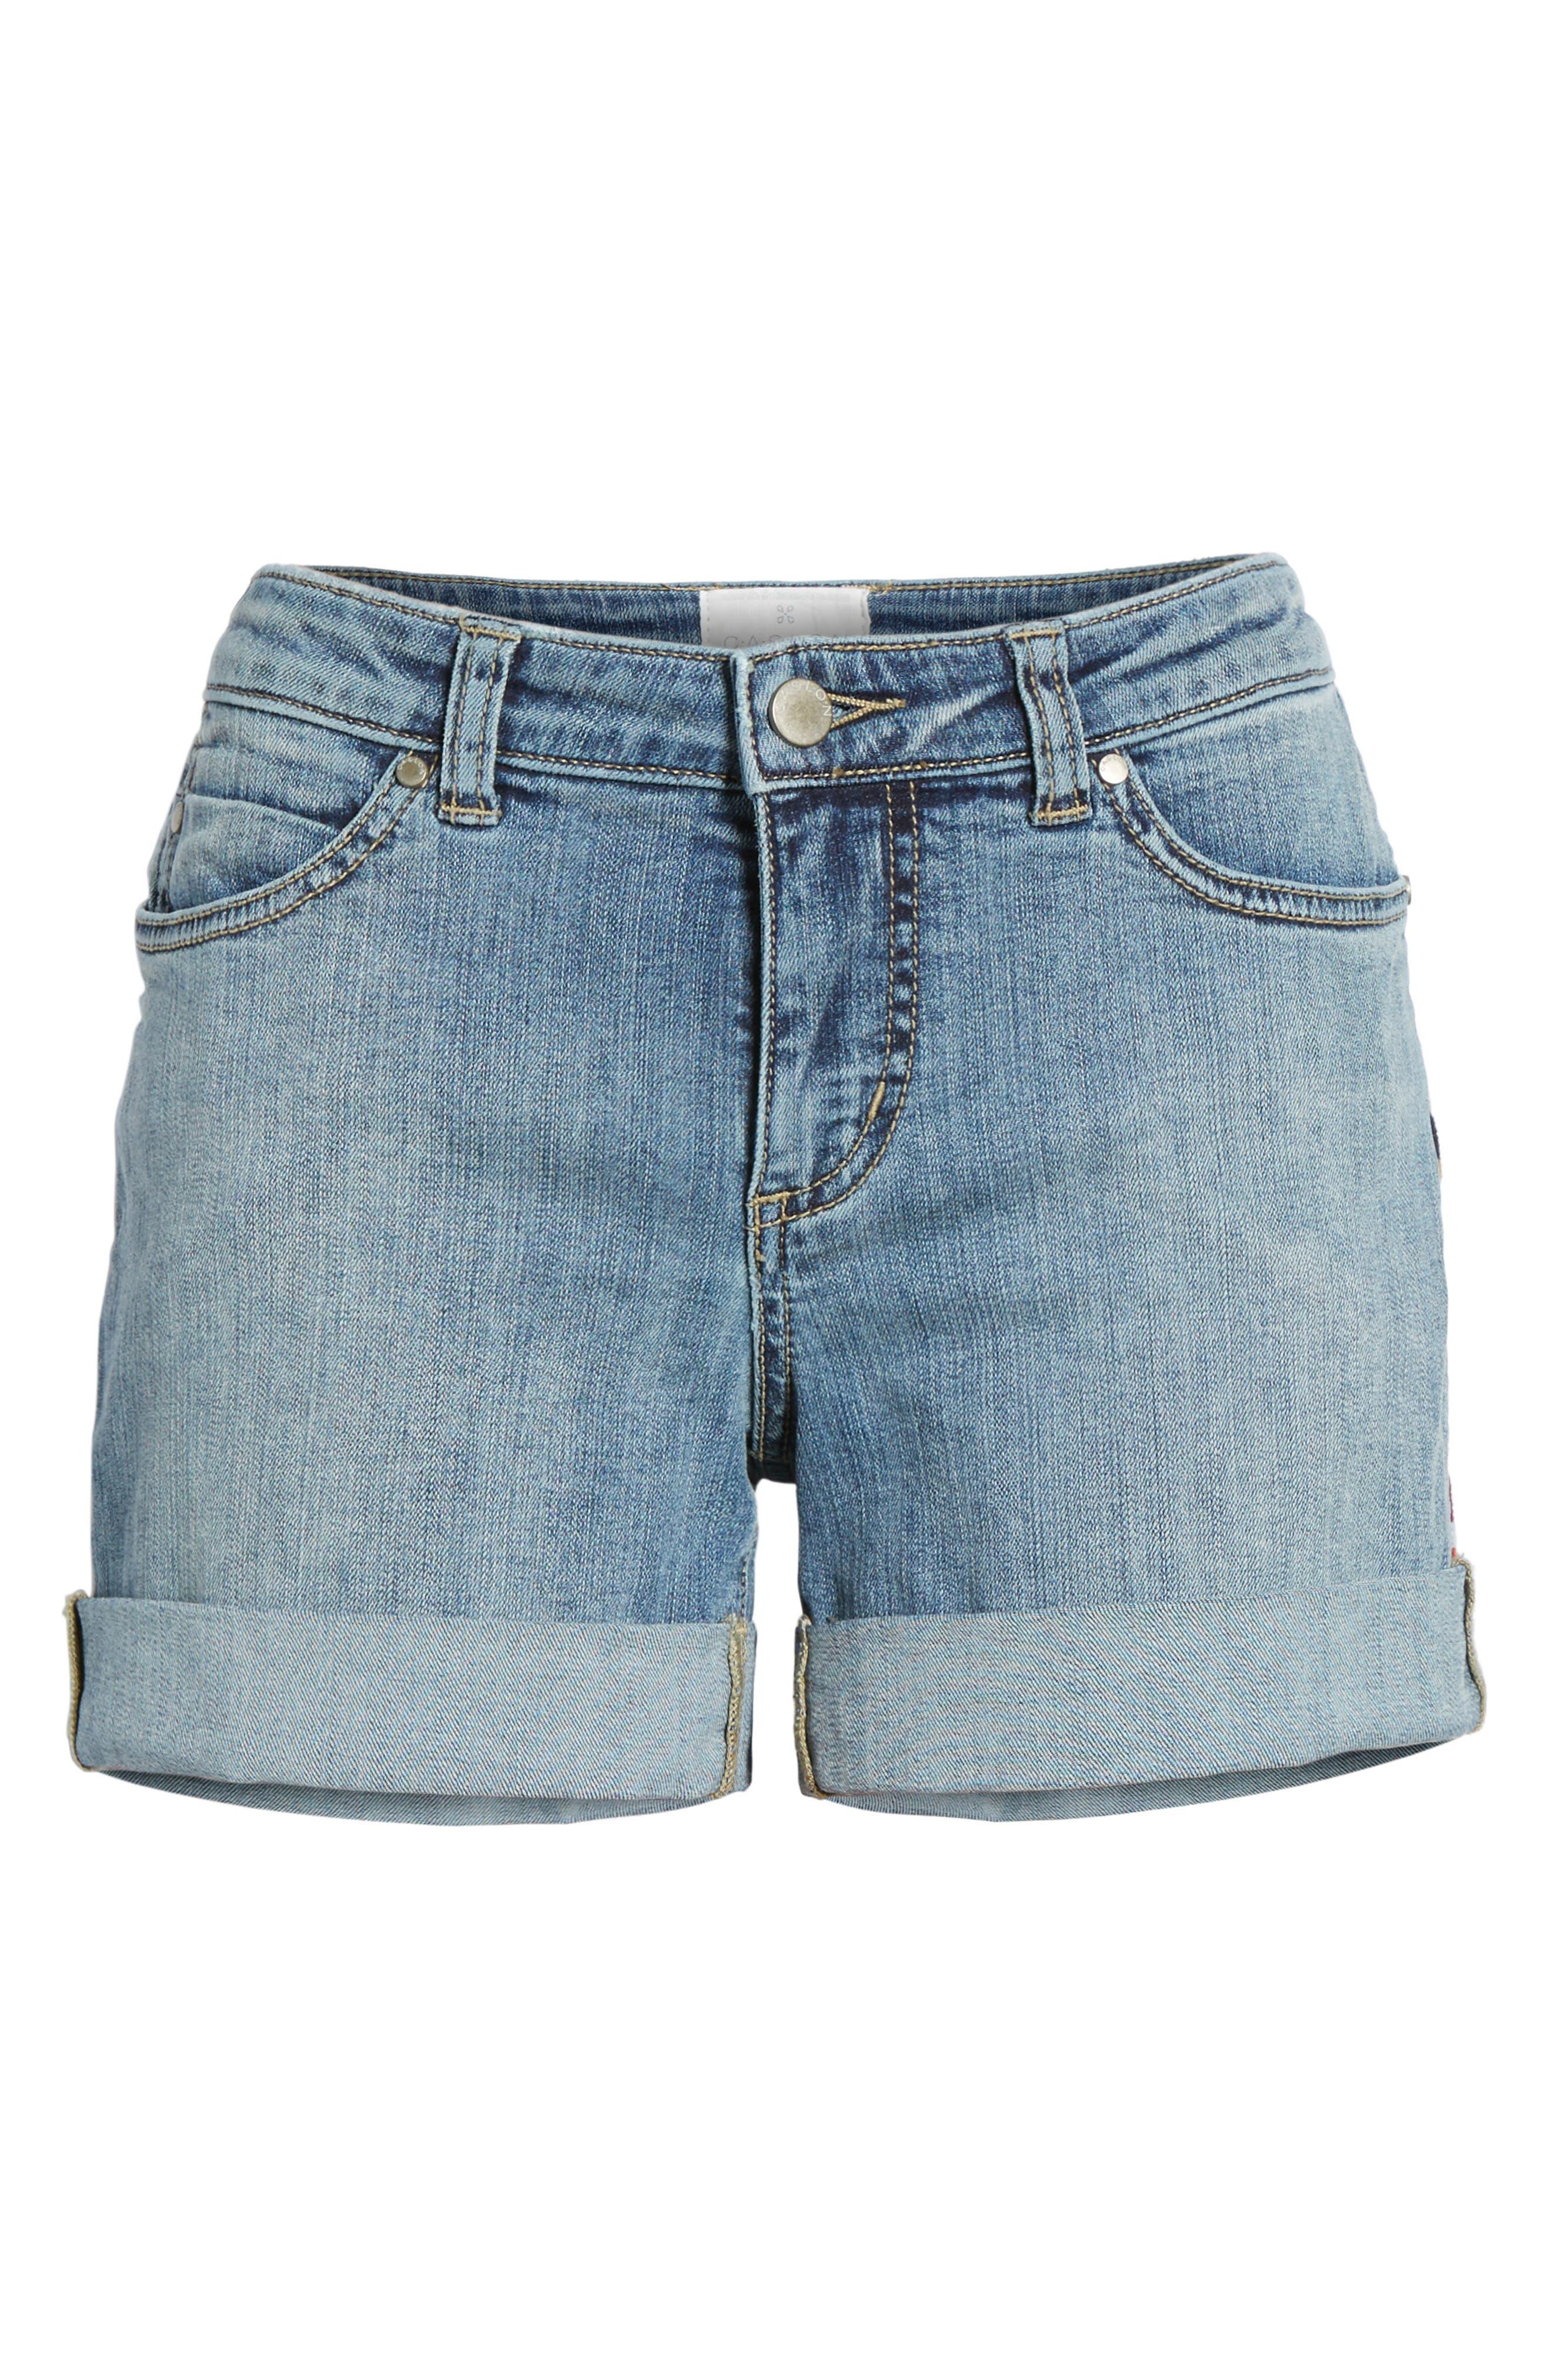 Embroidered Seam Boyfriend Denim Shorts,                             Alternate thumbnail 6, color,                             420